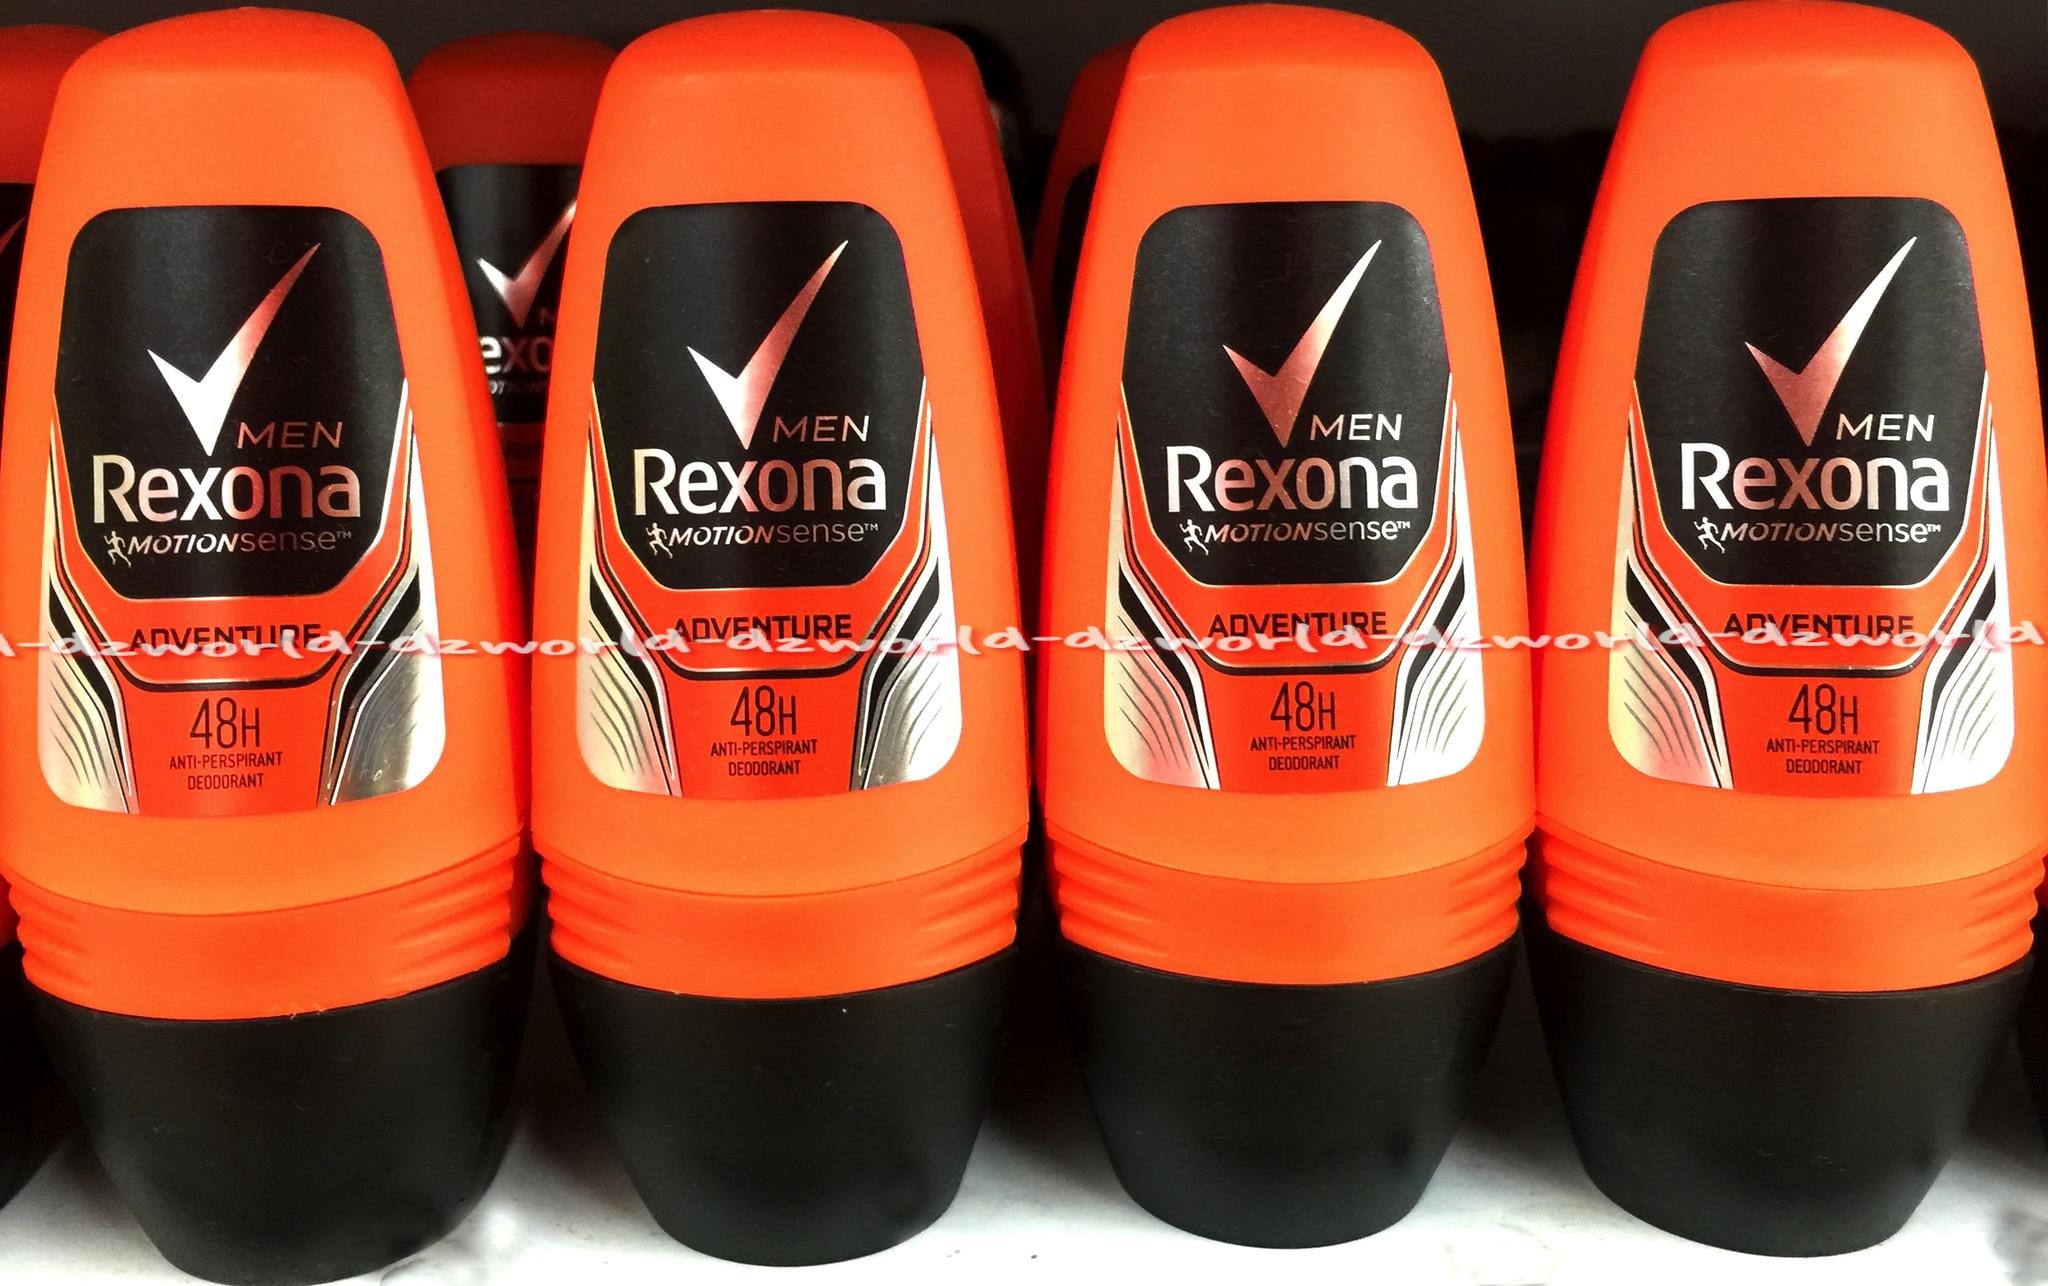 Jual Rexona Men Adventure 48h Roll On Untuk Pria Orange Dz Deodorant World Tokopedia